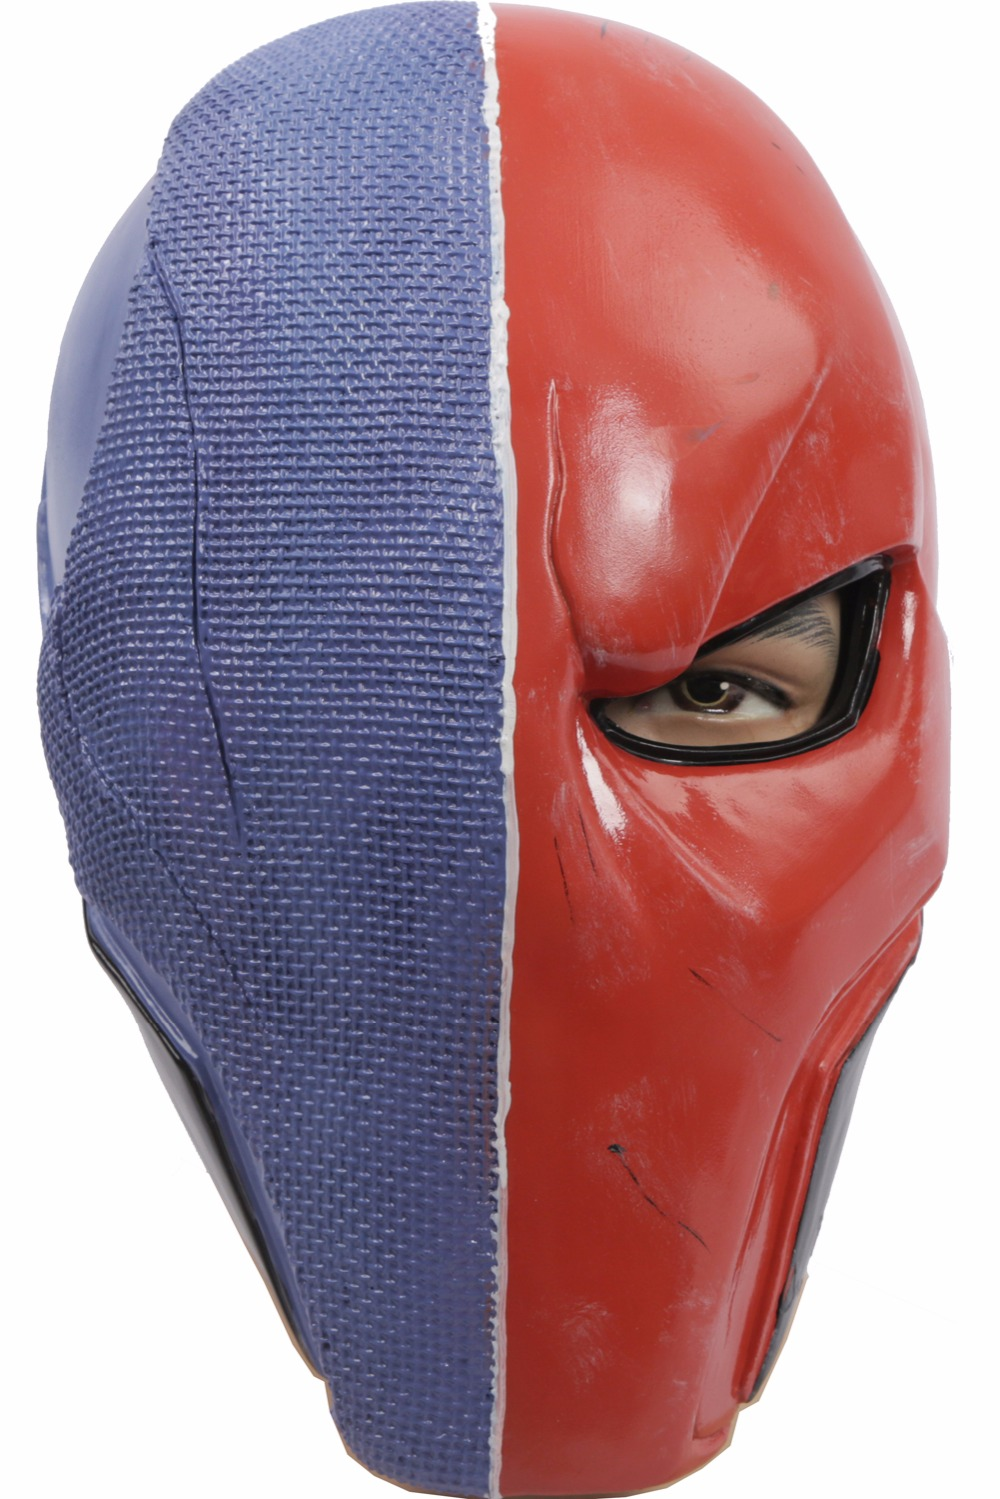 Aliexpress.com : Buy Xcoser 2016 New Hot Deathstroke Mask Helmet ...